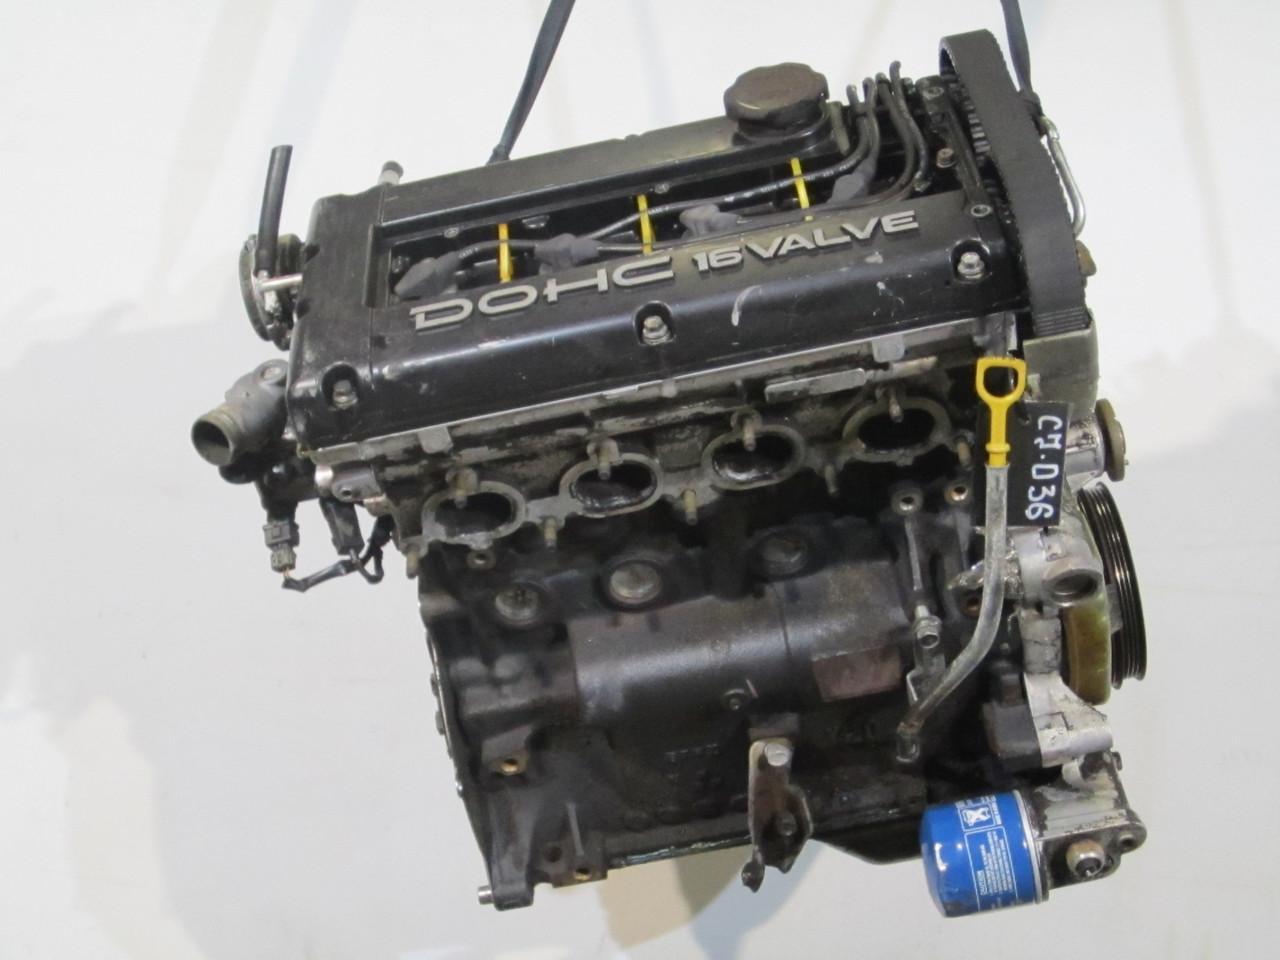 Двигатель Hyundai Sonata. Кузов: 3. G4CP. , 2.0л., 125л.с. 16 клап.